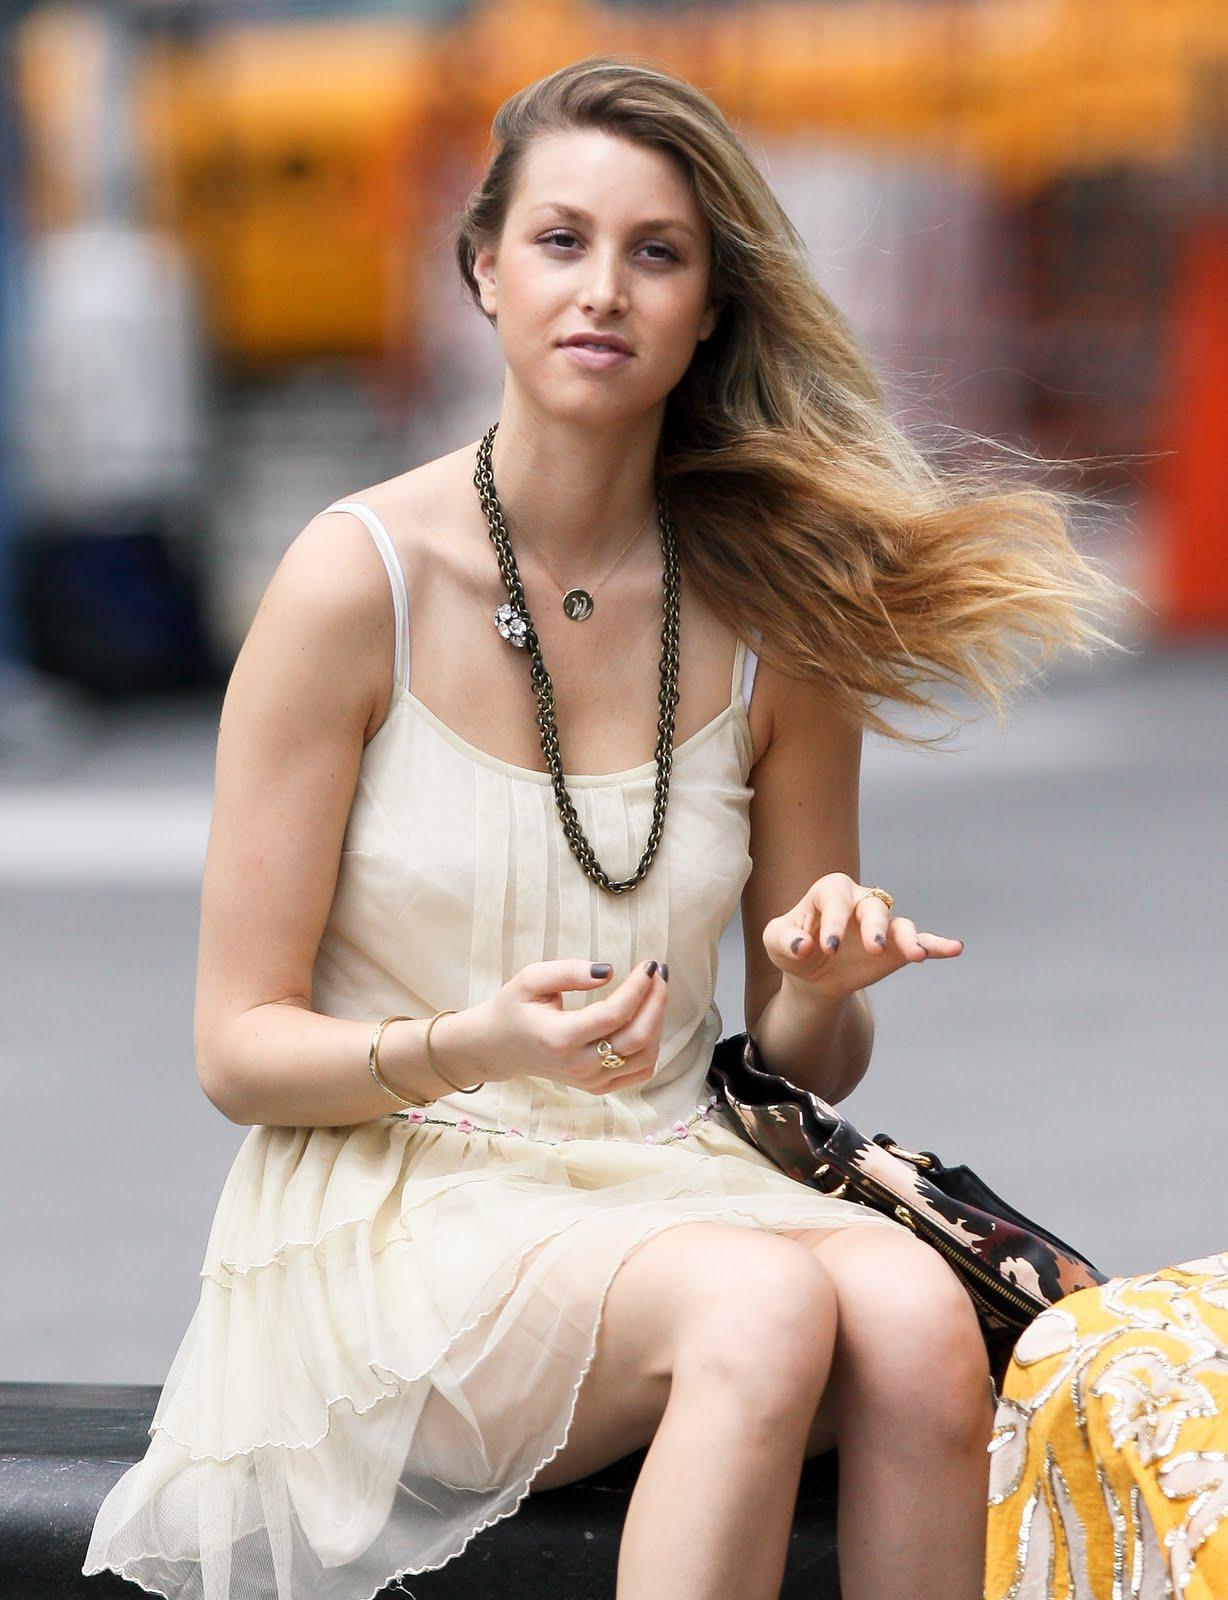 Video Amanda Pizziconi nudes (34 photos), Tits, Sideboobs, Feet, in bikini 2015